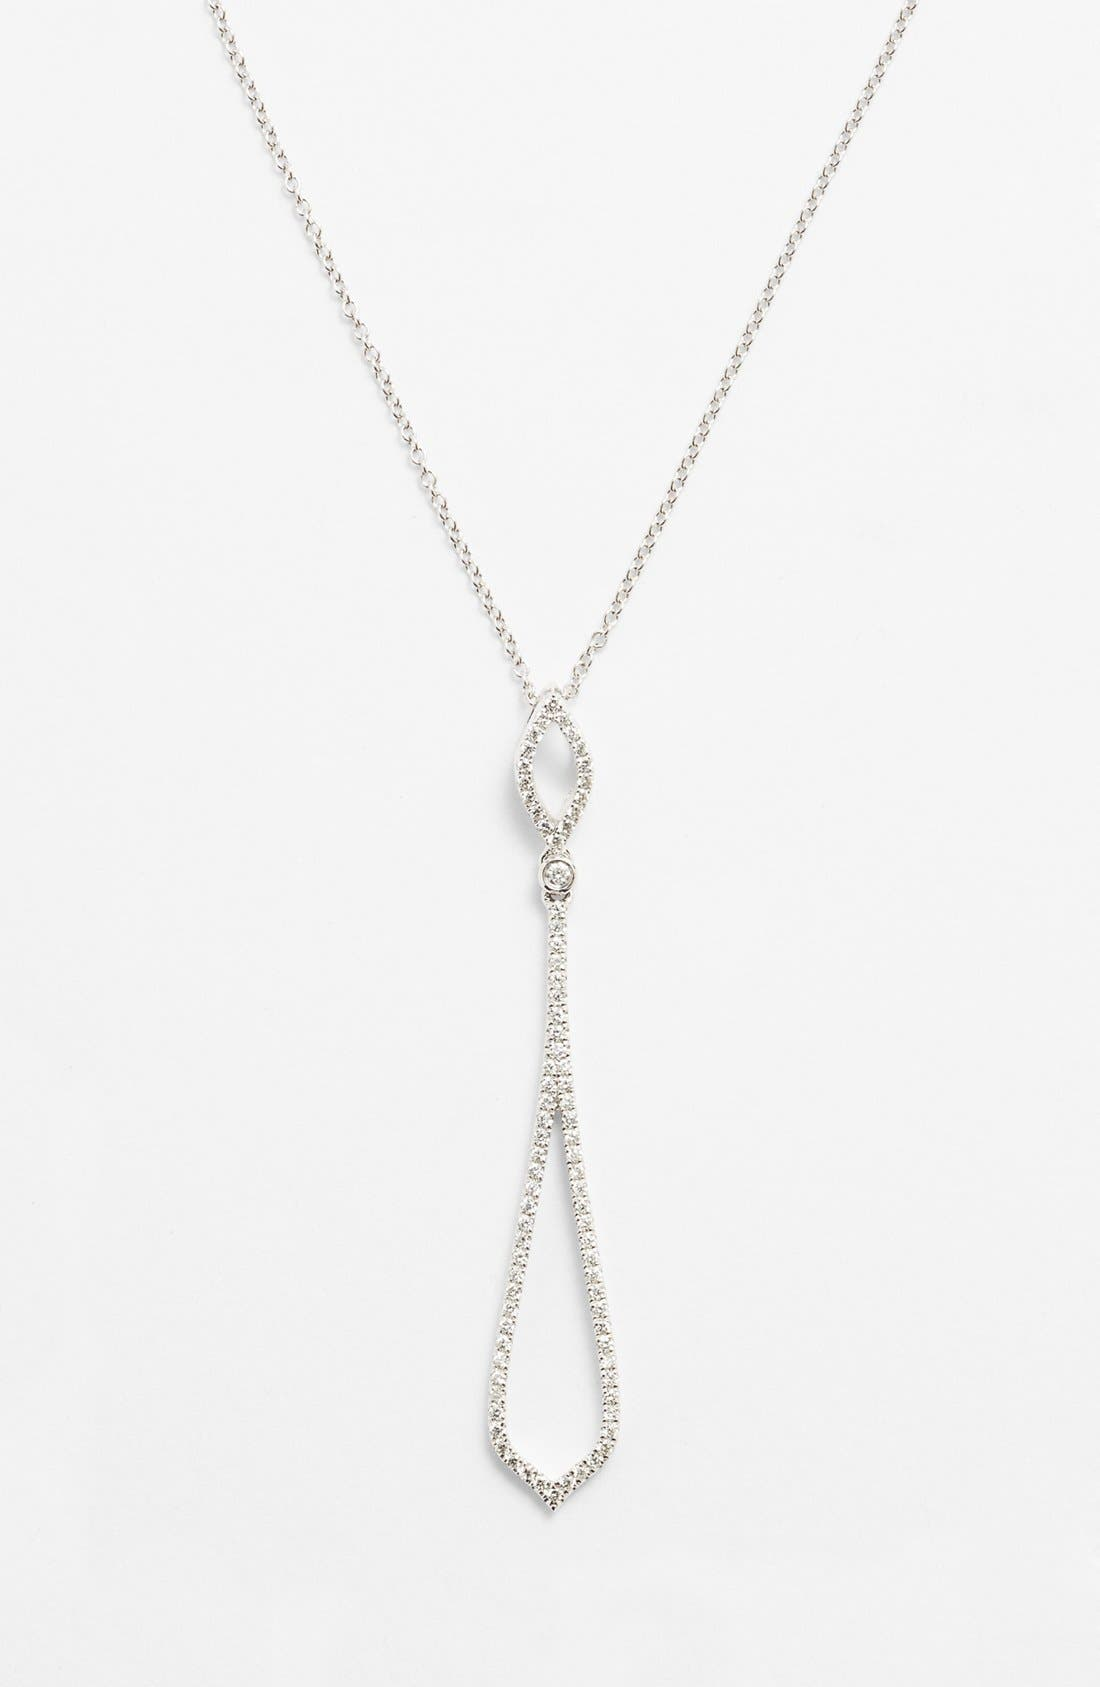 Alternate Image 1 Selected - Bony Levy Pavé Diamond Pendant Necklace (Nordstrom Exclusive)